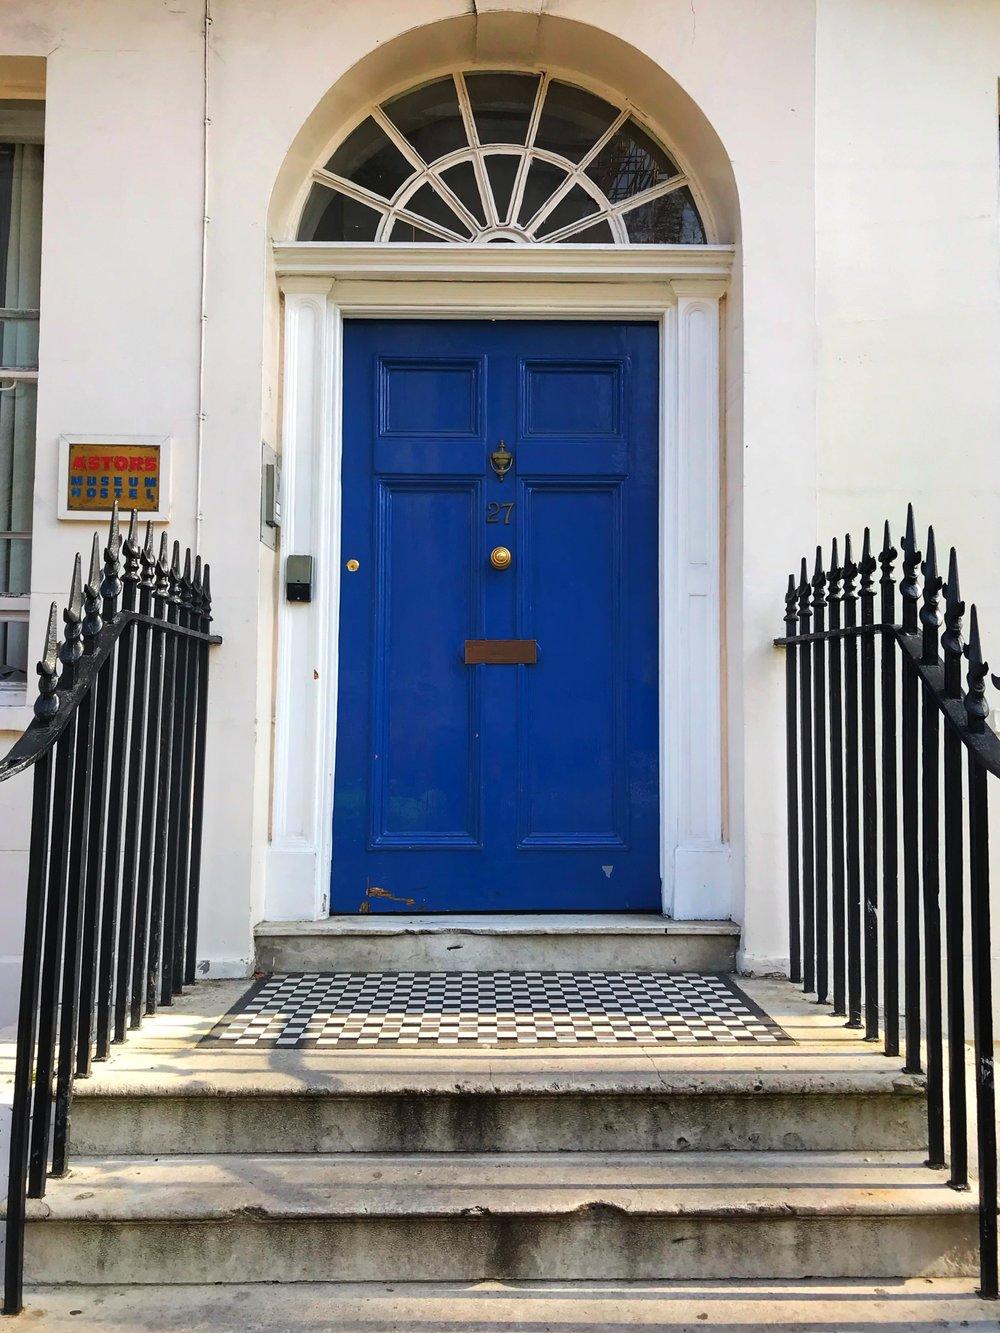 Visit London - Astor Hostels Museum Location